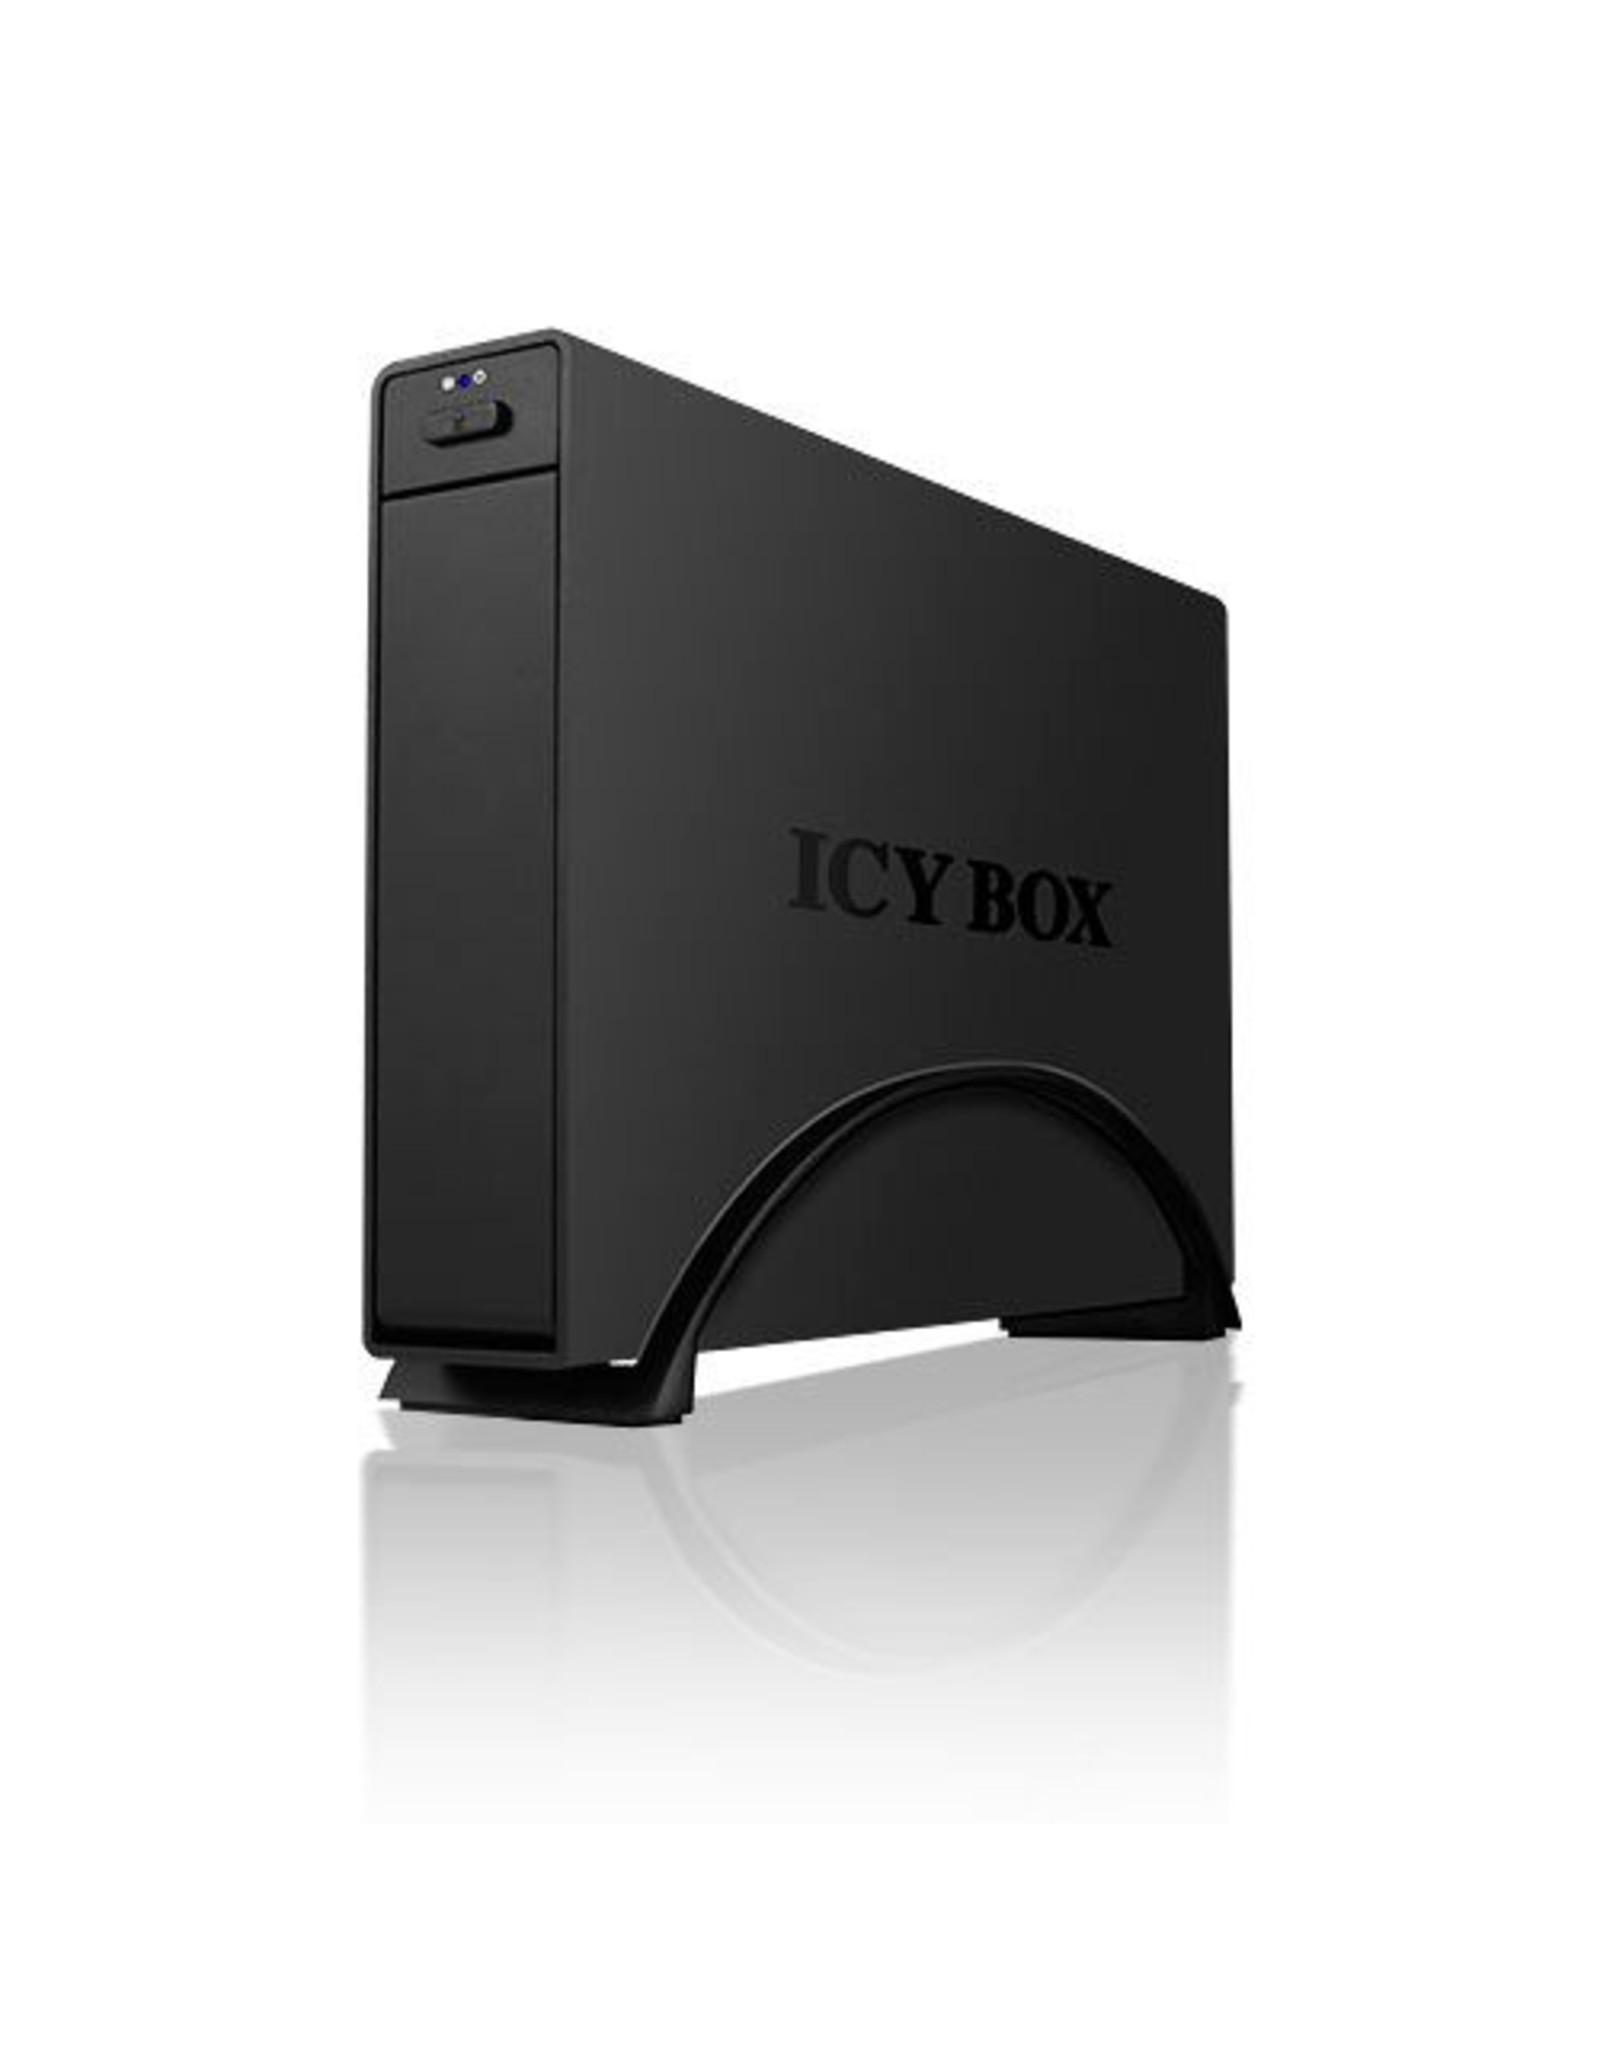 ICY BOX Icy Box IB-366StU3 b